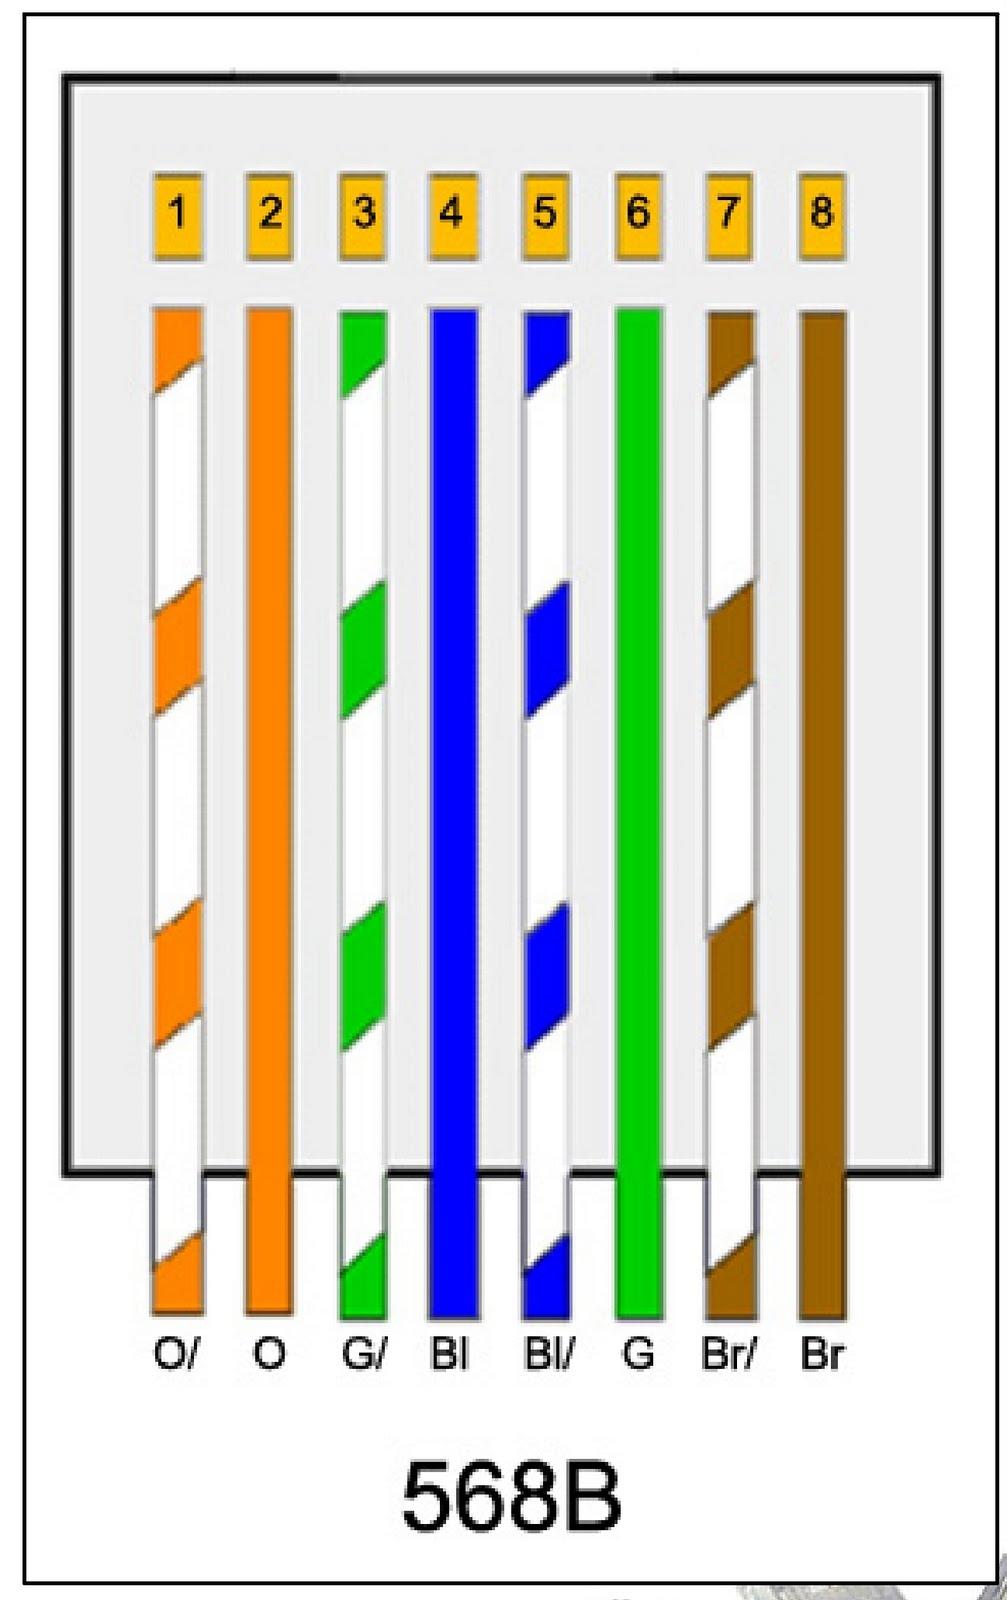 Cat6 Diagram : diagram, DIAGRAM], Cat6e, Ethernet, Cable, Wiring, Diagram, Version, Quality, MEDIAGRAMLTD.ANTEPRIMAMONTEPULCIANODABRUZZO.IT